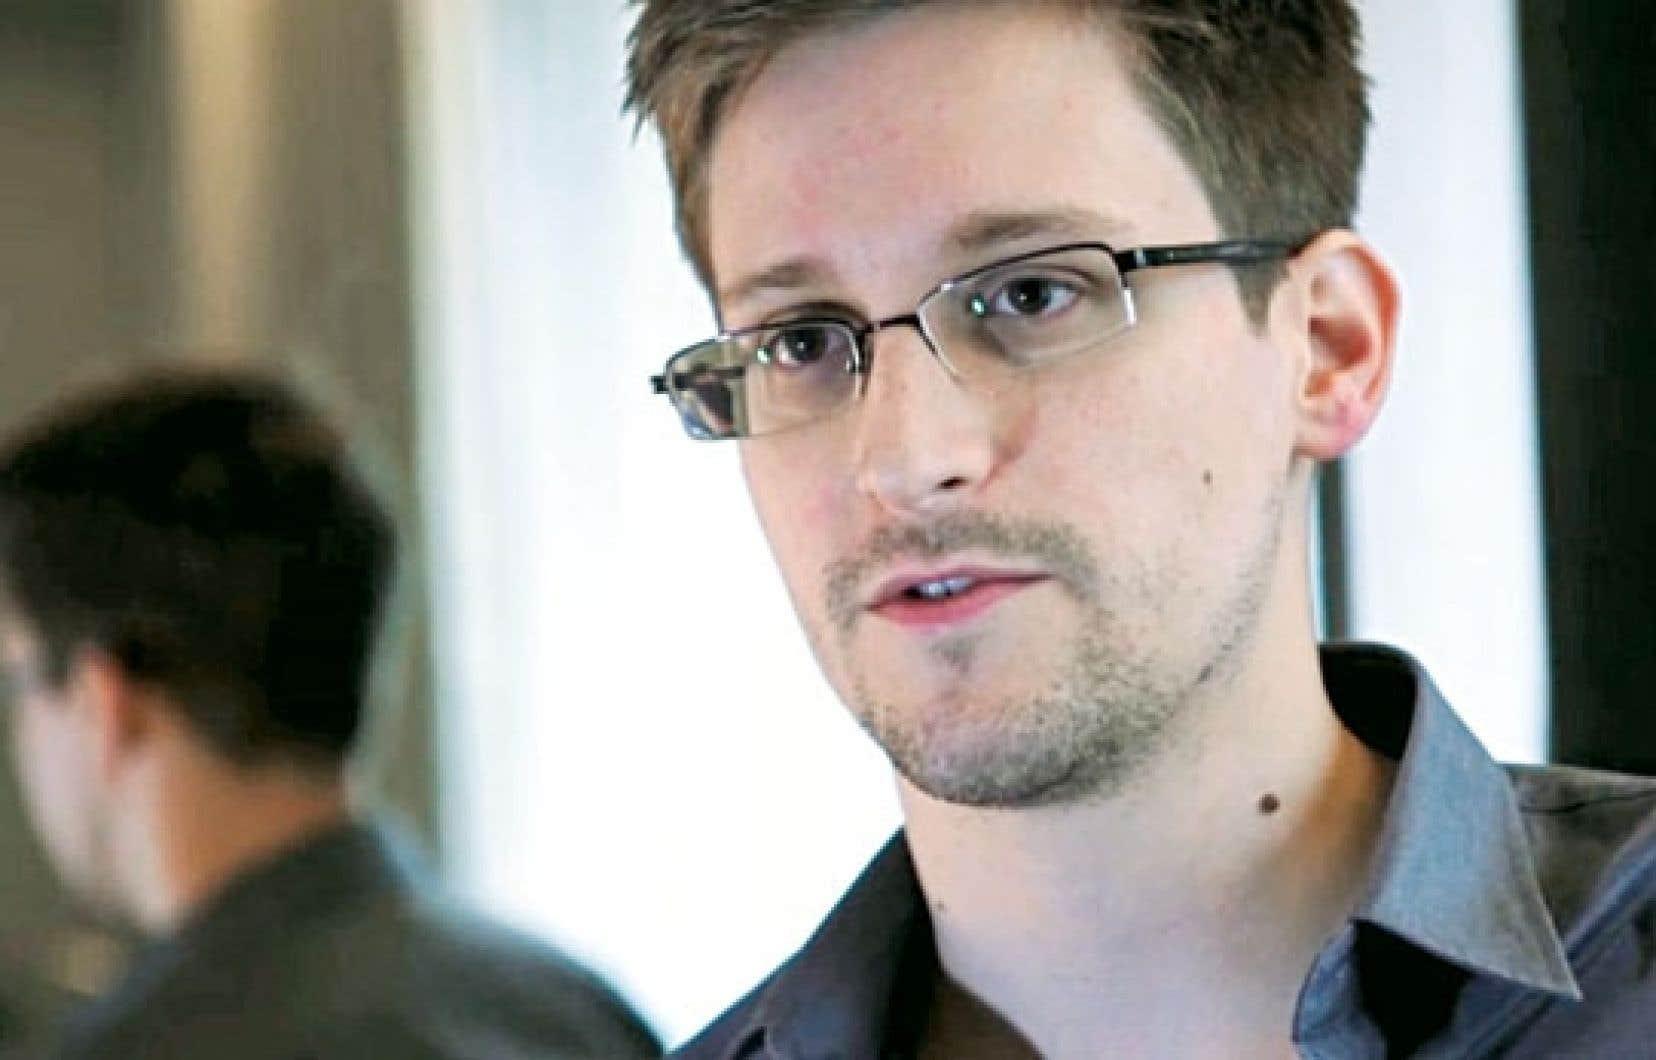 «Je ne suis ni un traître ni un héros», a affirmé Edward Snowden.